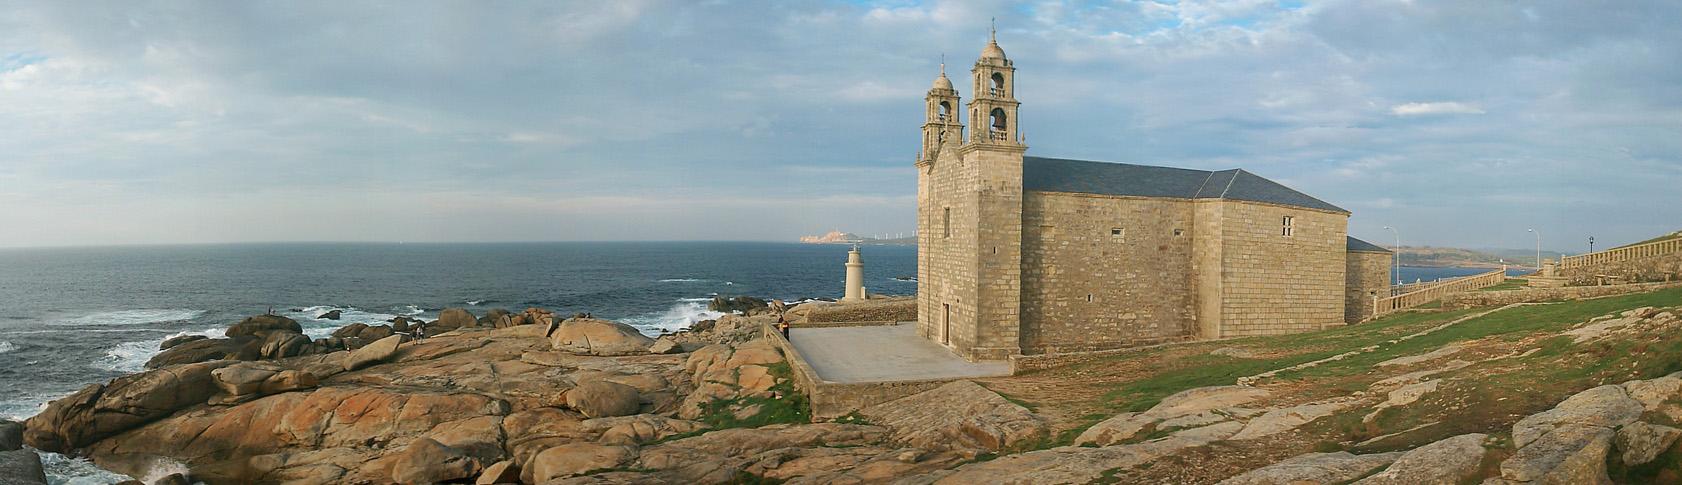 Foto playa O Coido. Santuario de Nosa Señora da Barca (Virgen de la Barca)